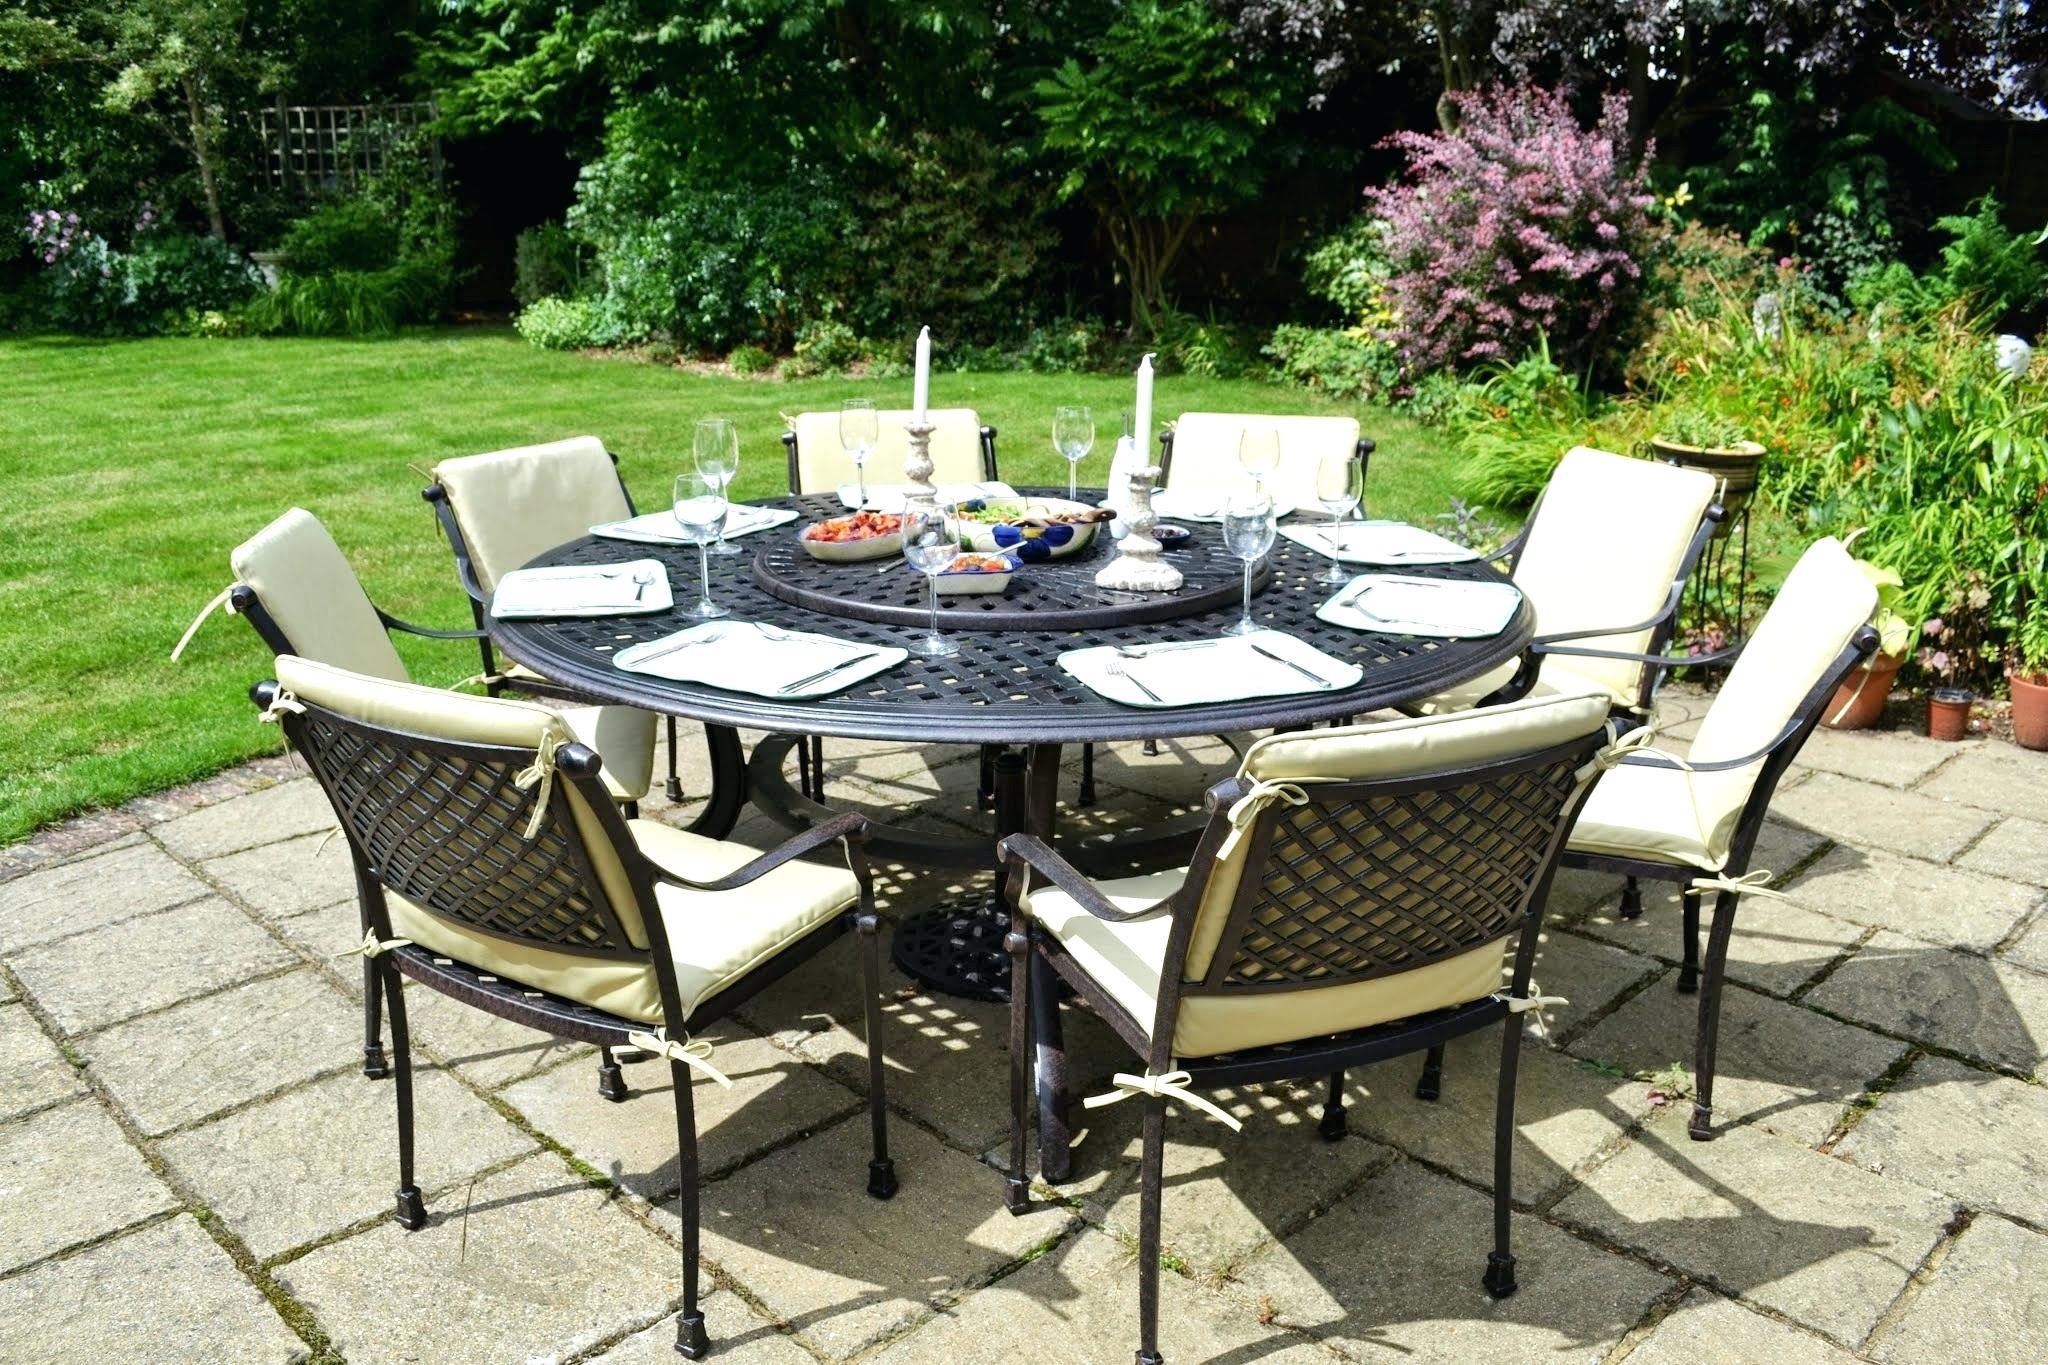 Stunning Salon De Jardin Table Ronde Extensible Photos - House ...